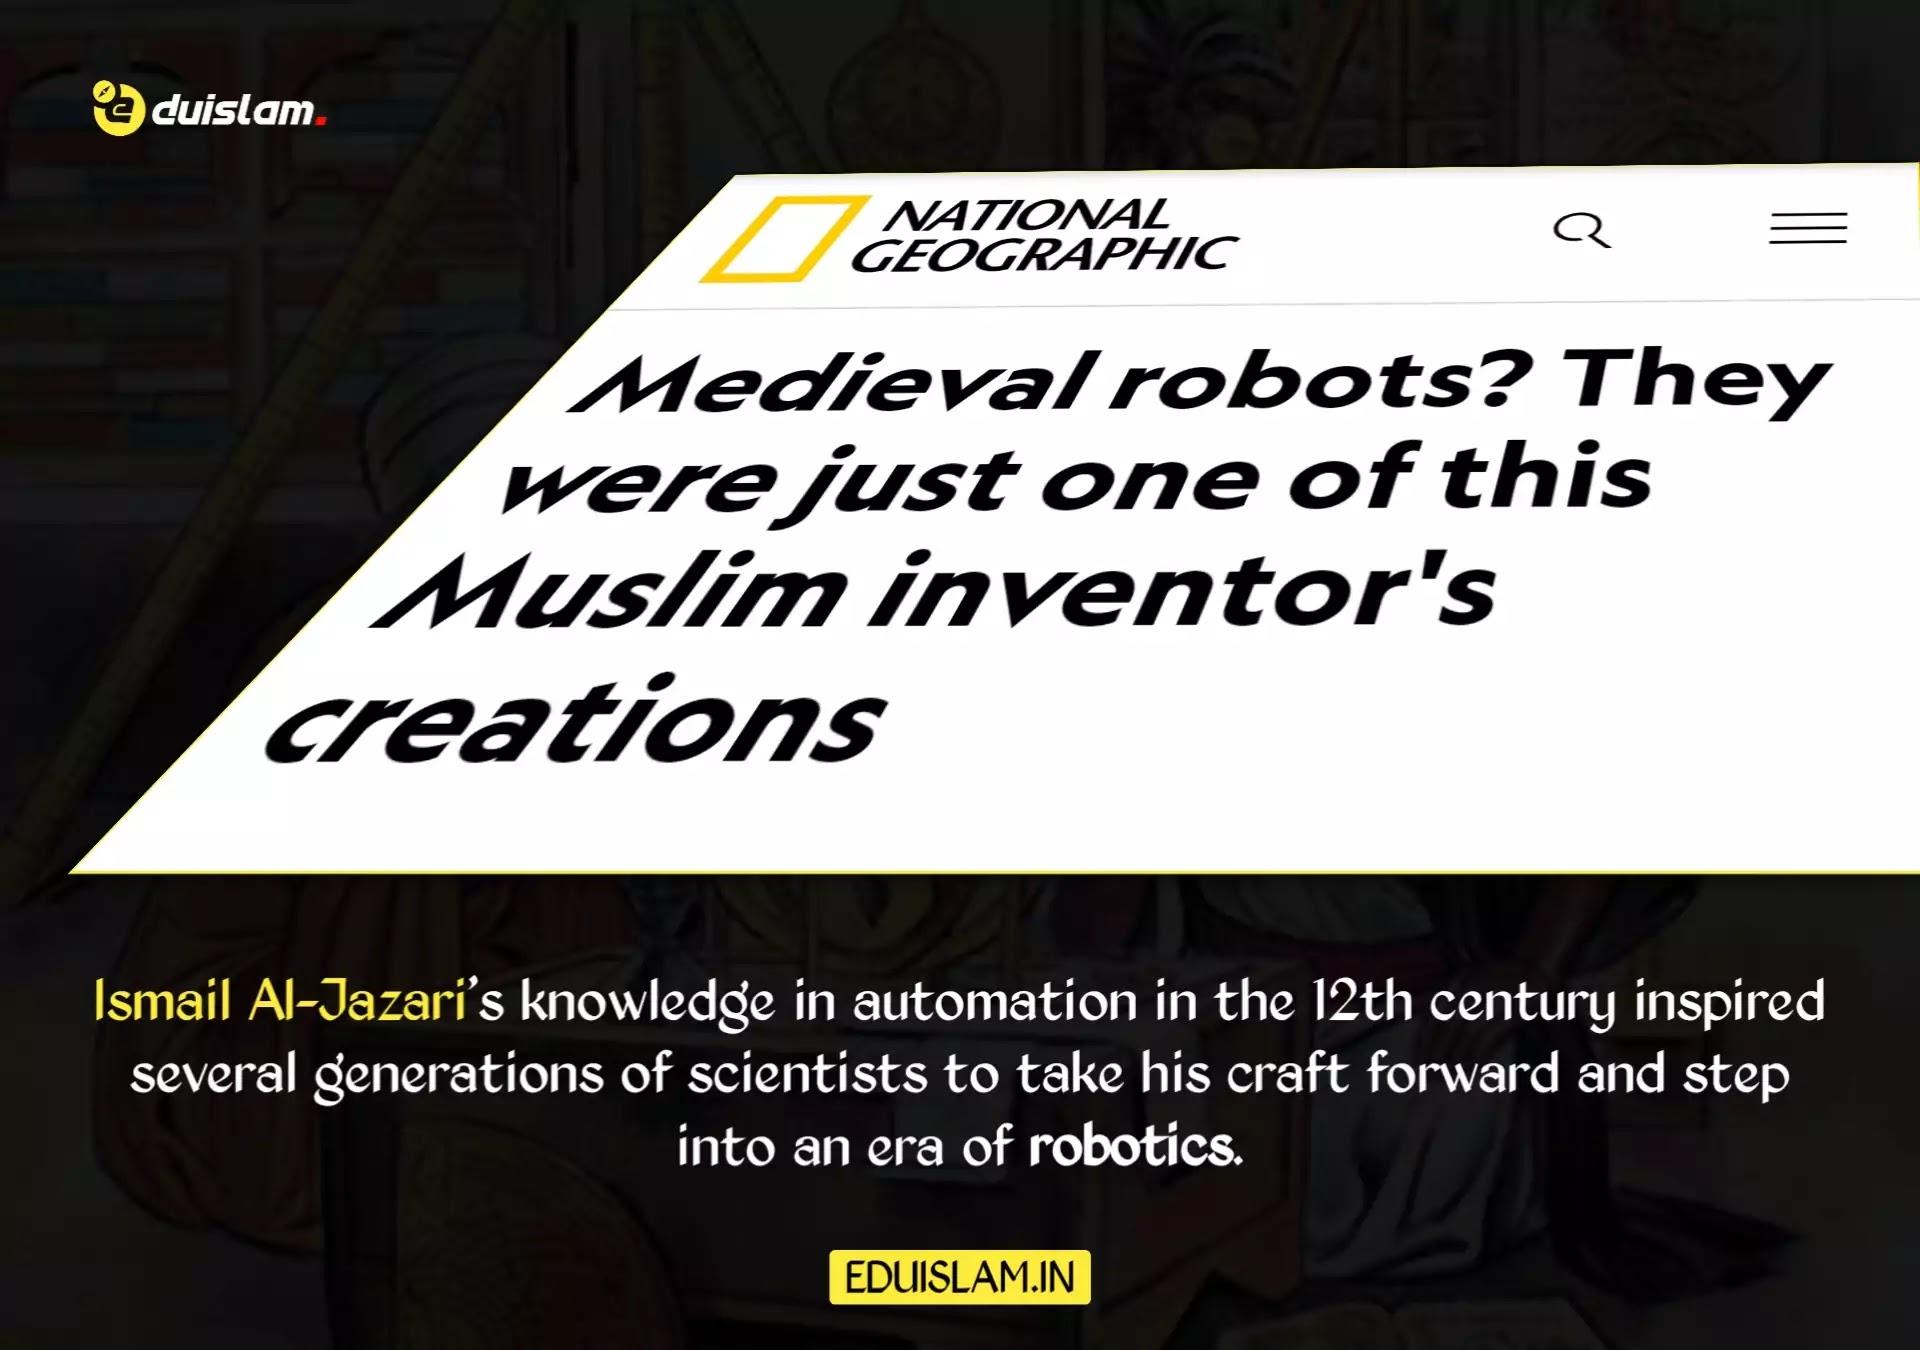 Al-Jazari's inventions